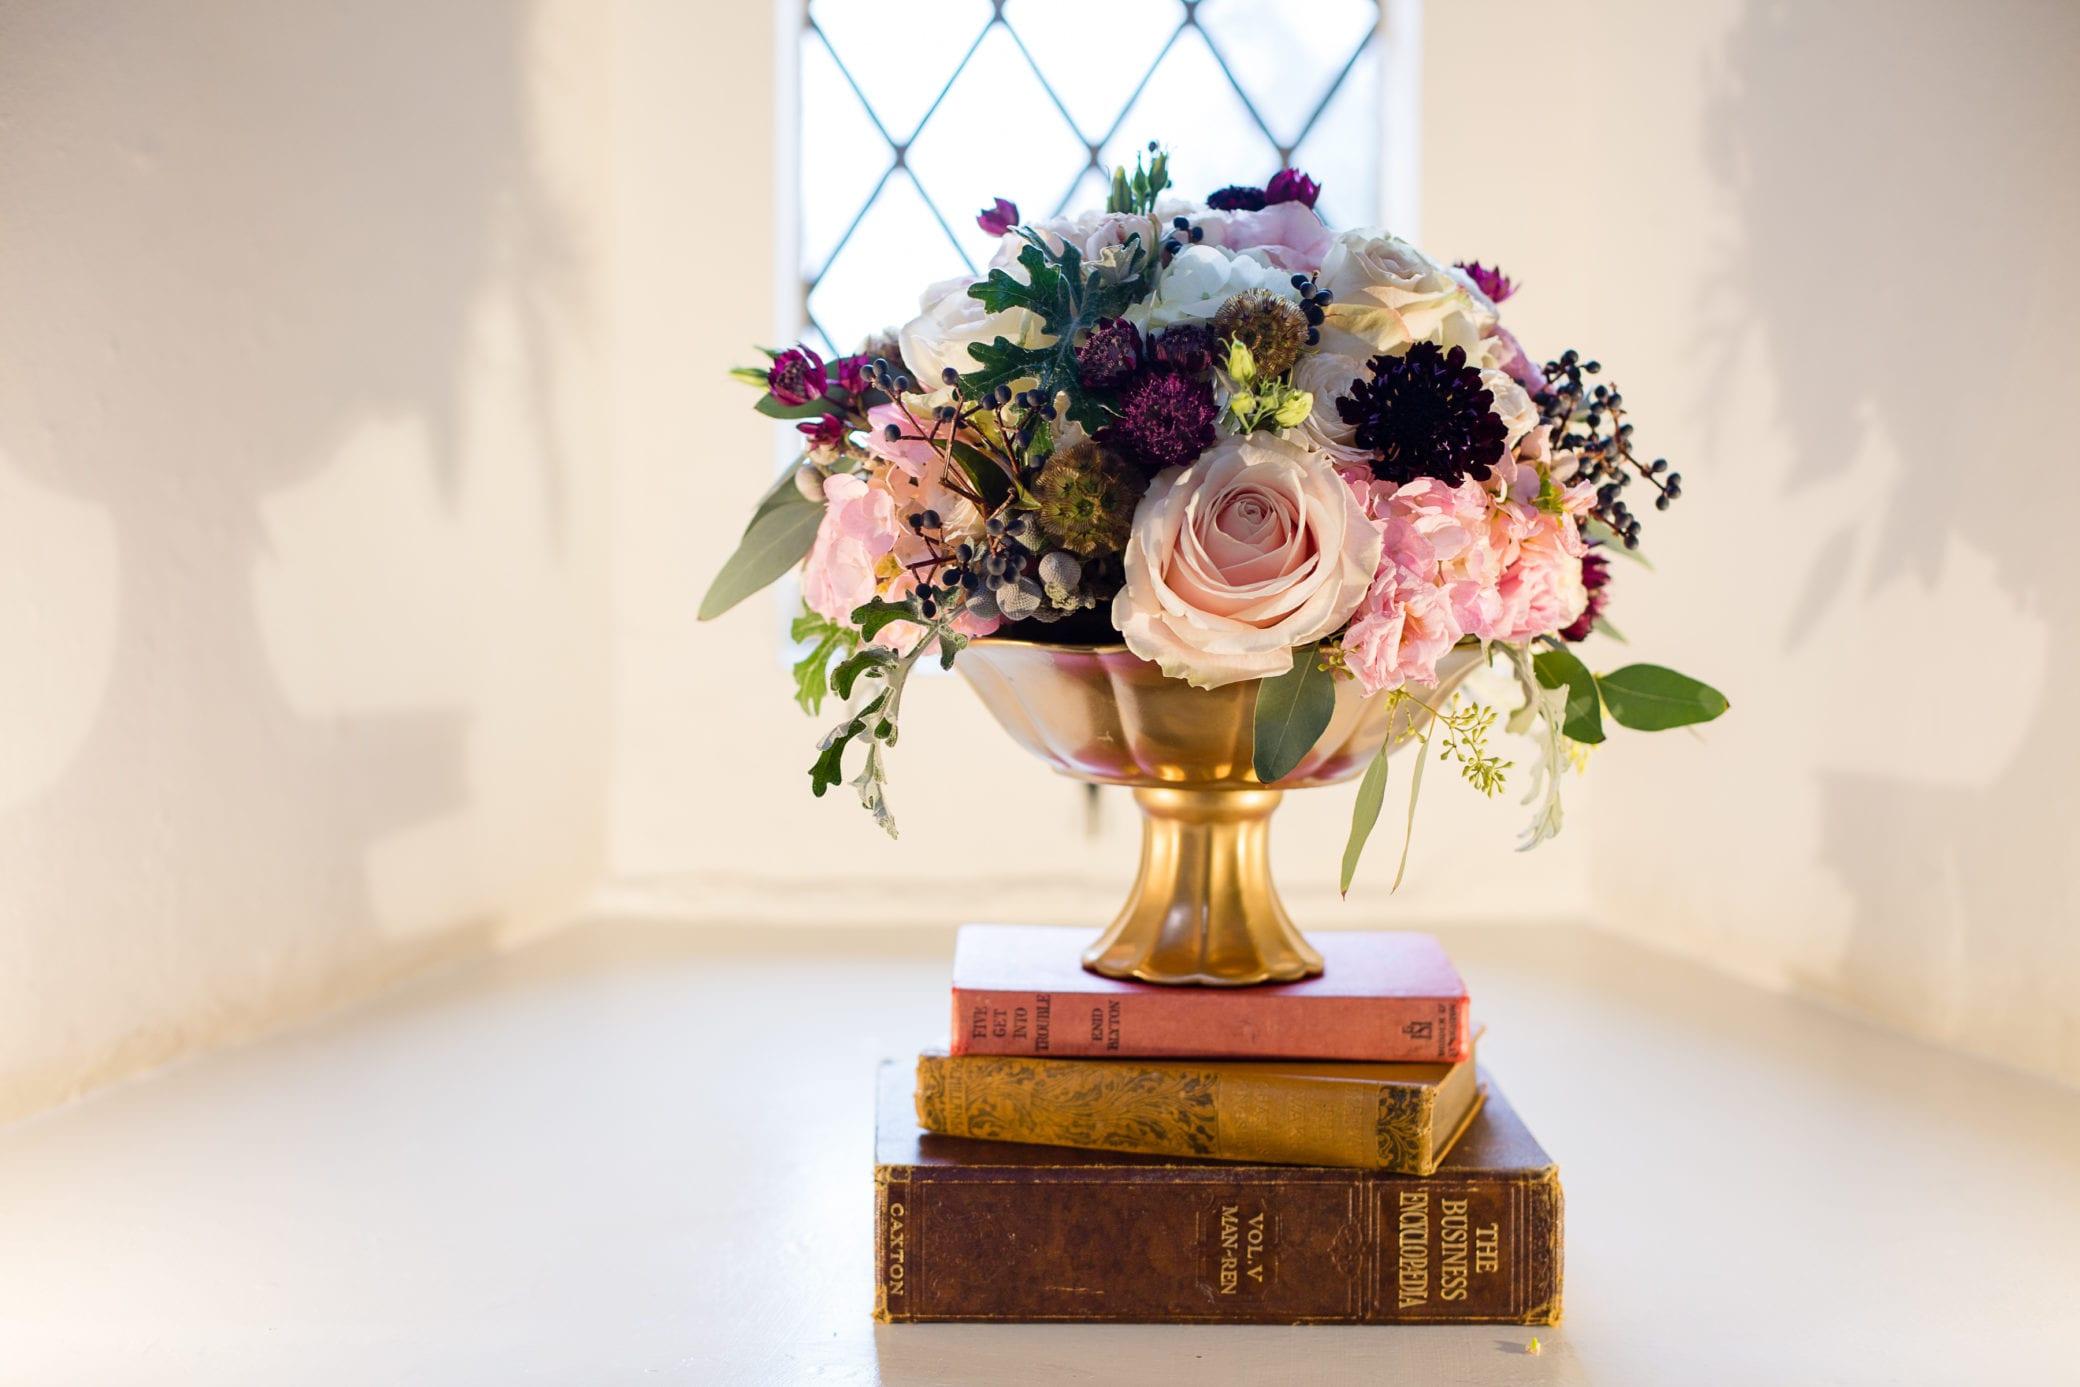 Stunning wedding flowers for a Castle wedding